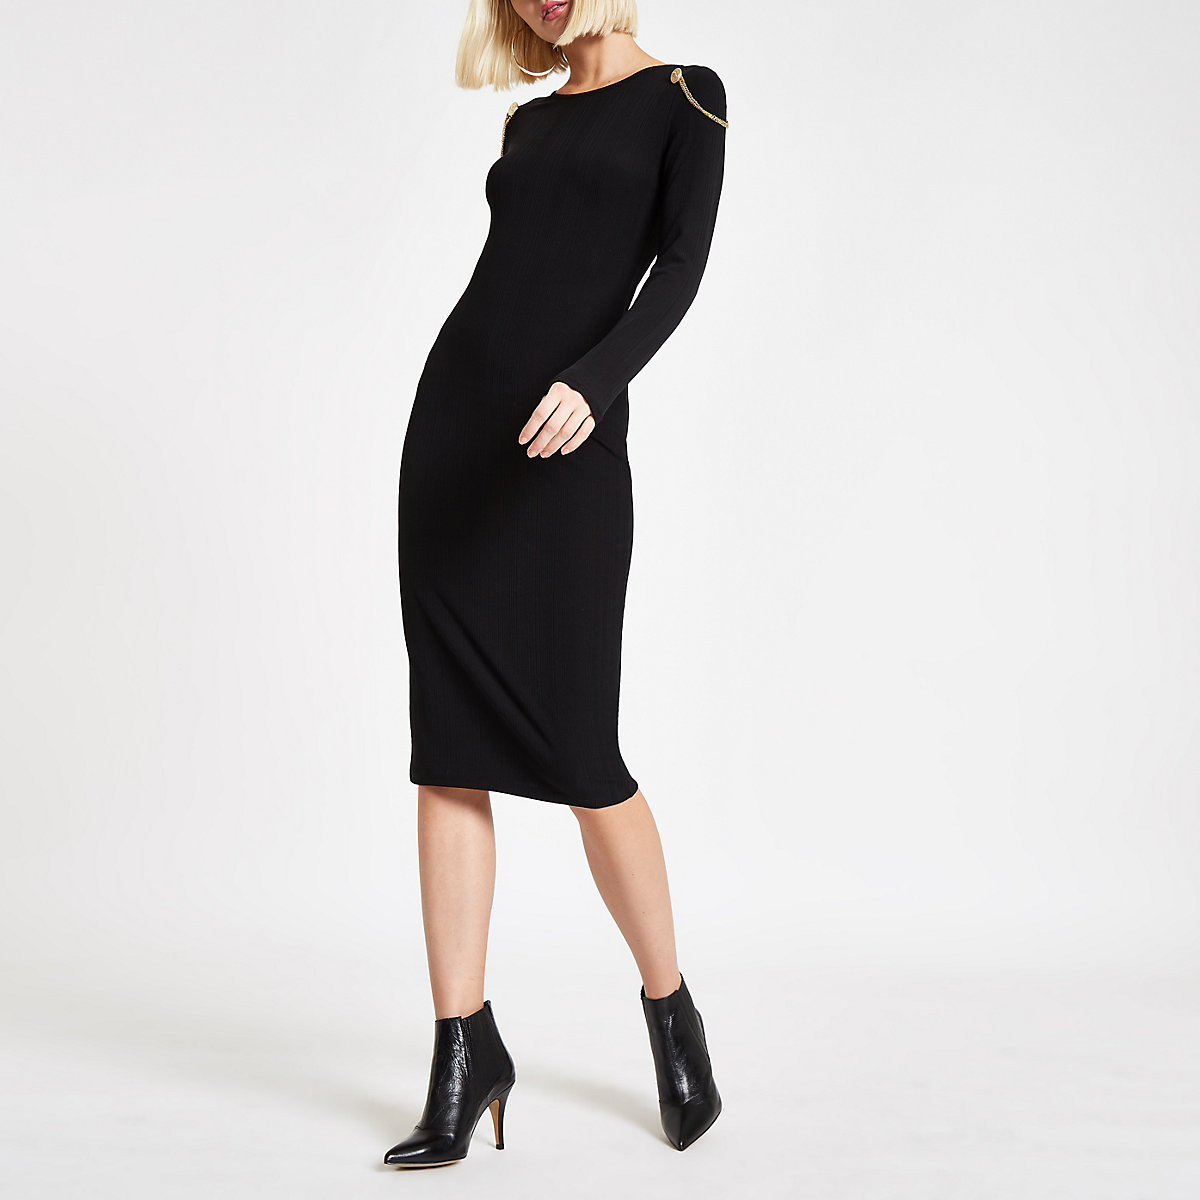 Schwarzes Bodycon-Kleid in Midilänge